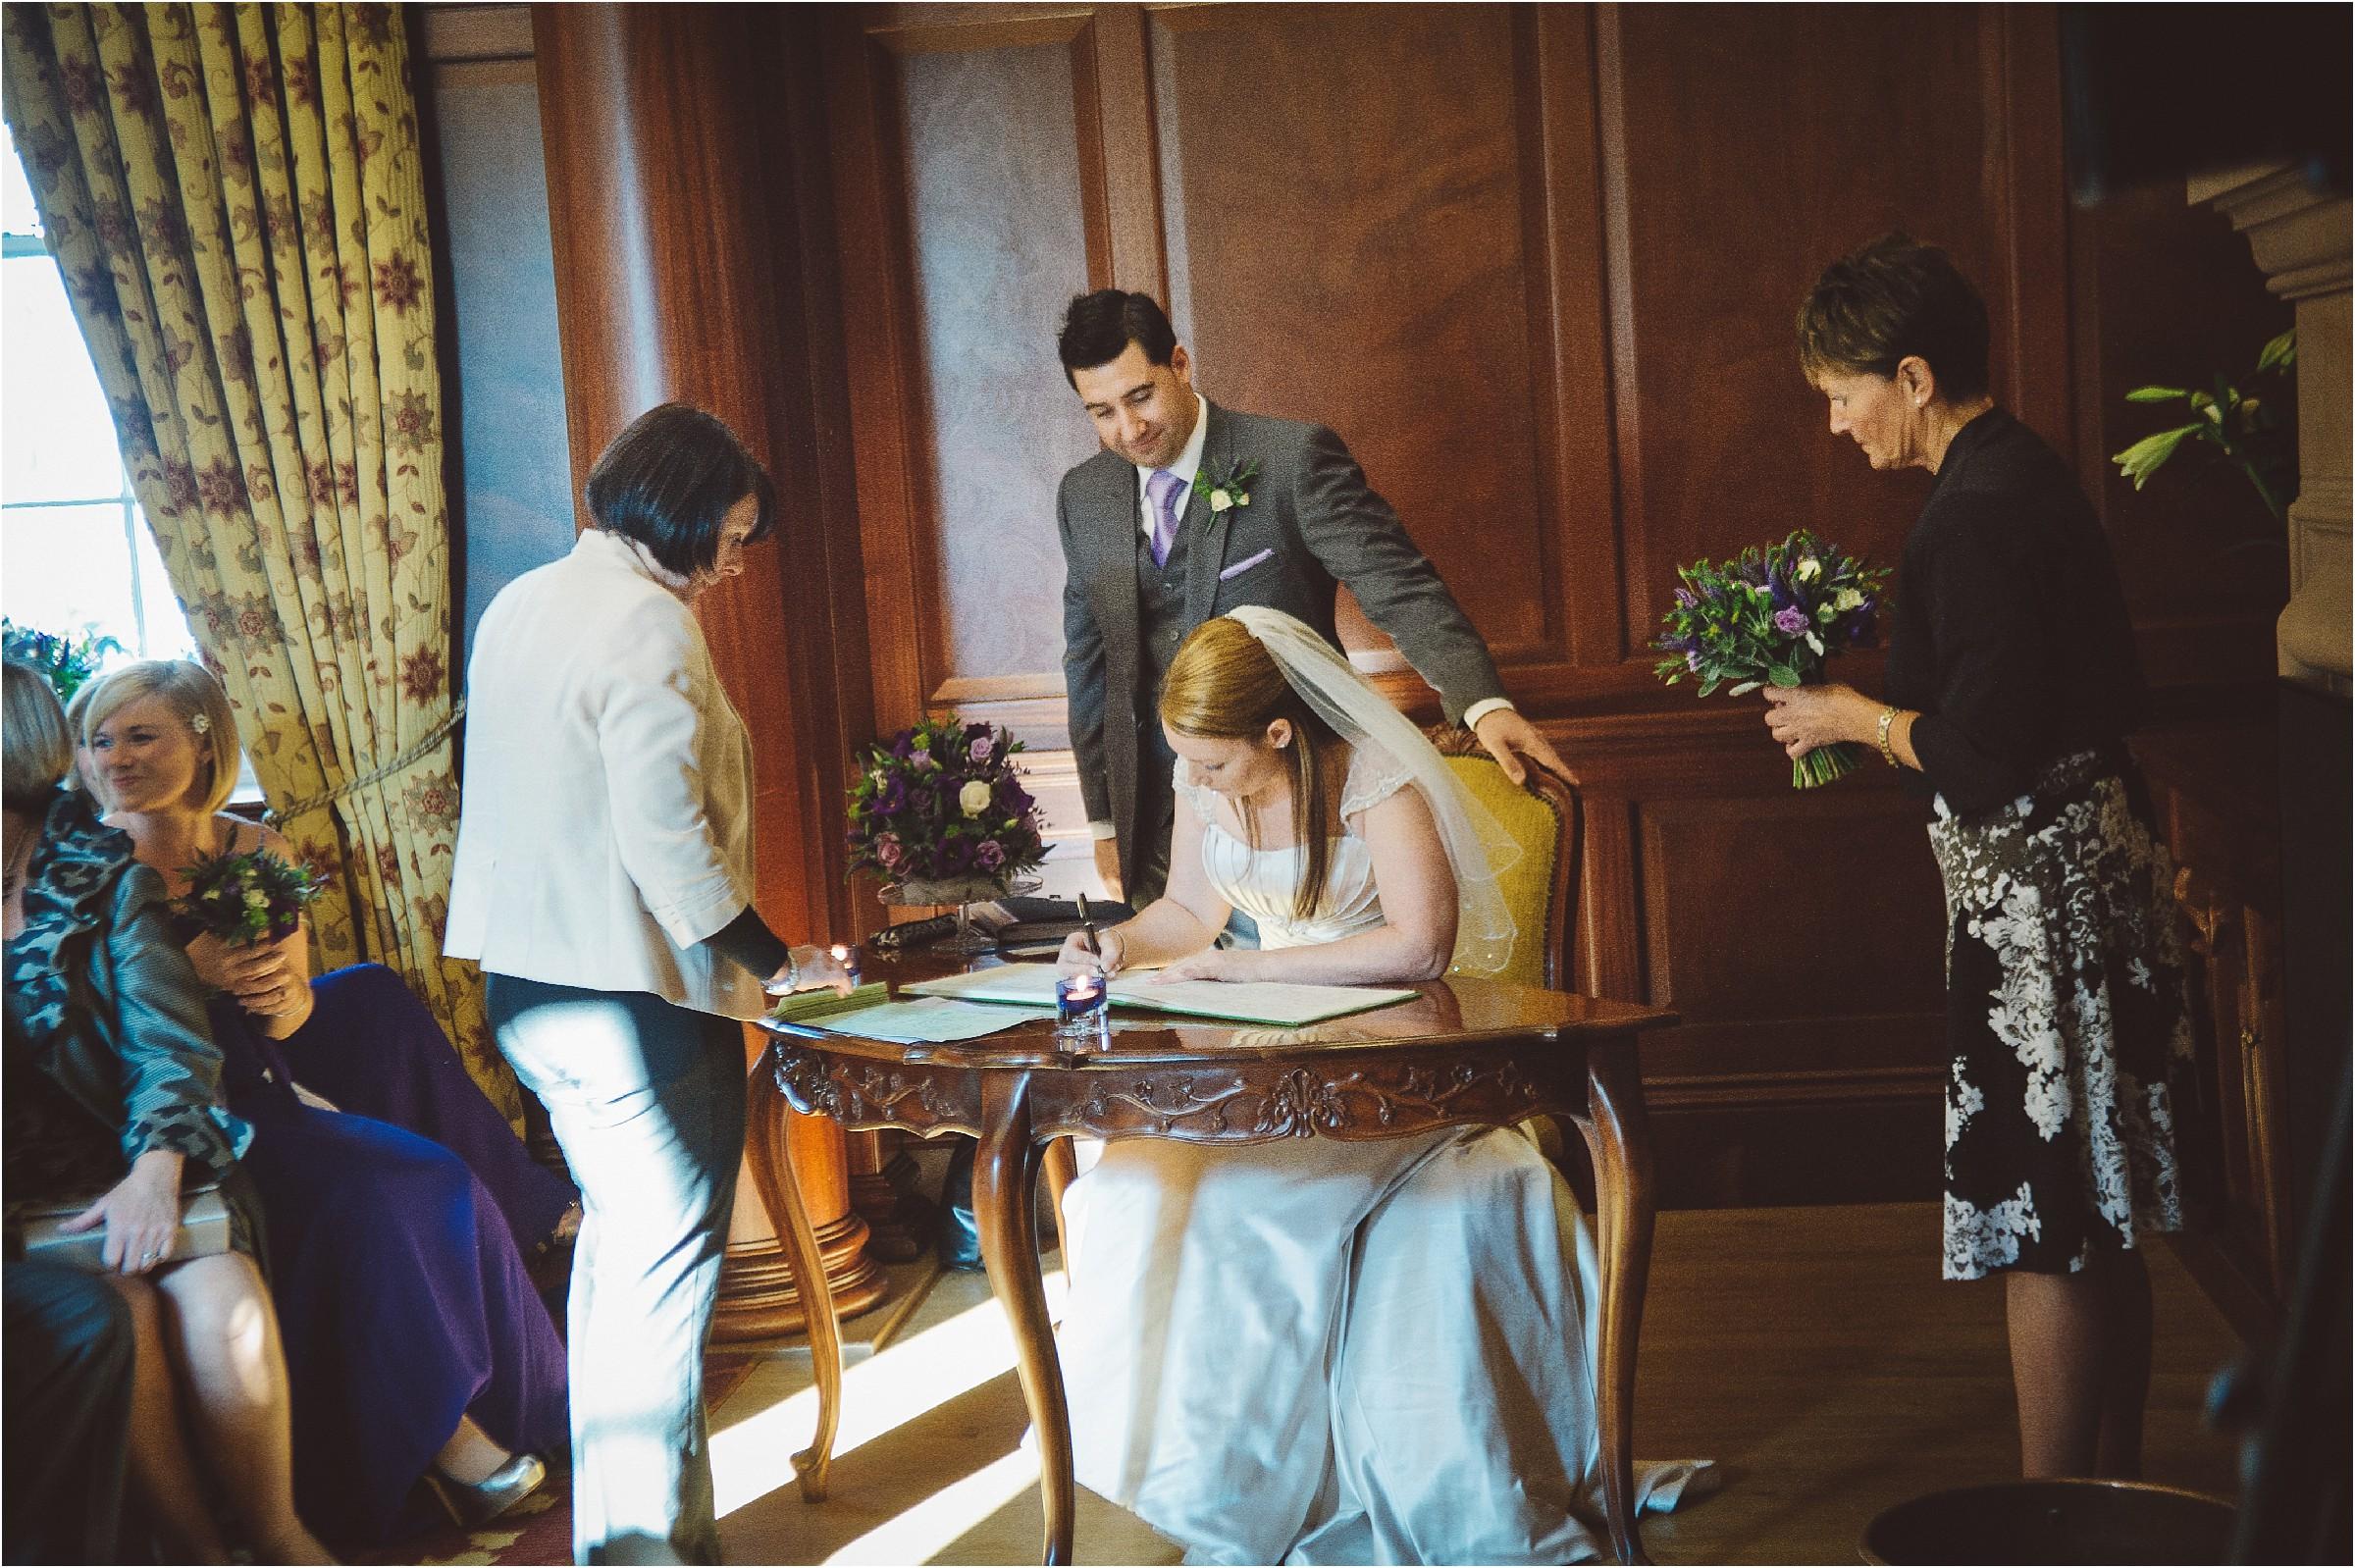 029 wedding photography doxford hall northumberlandDSC_0671e